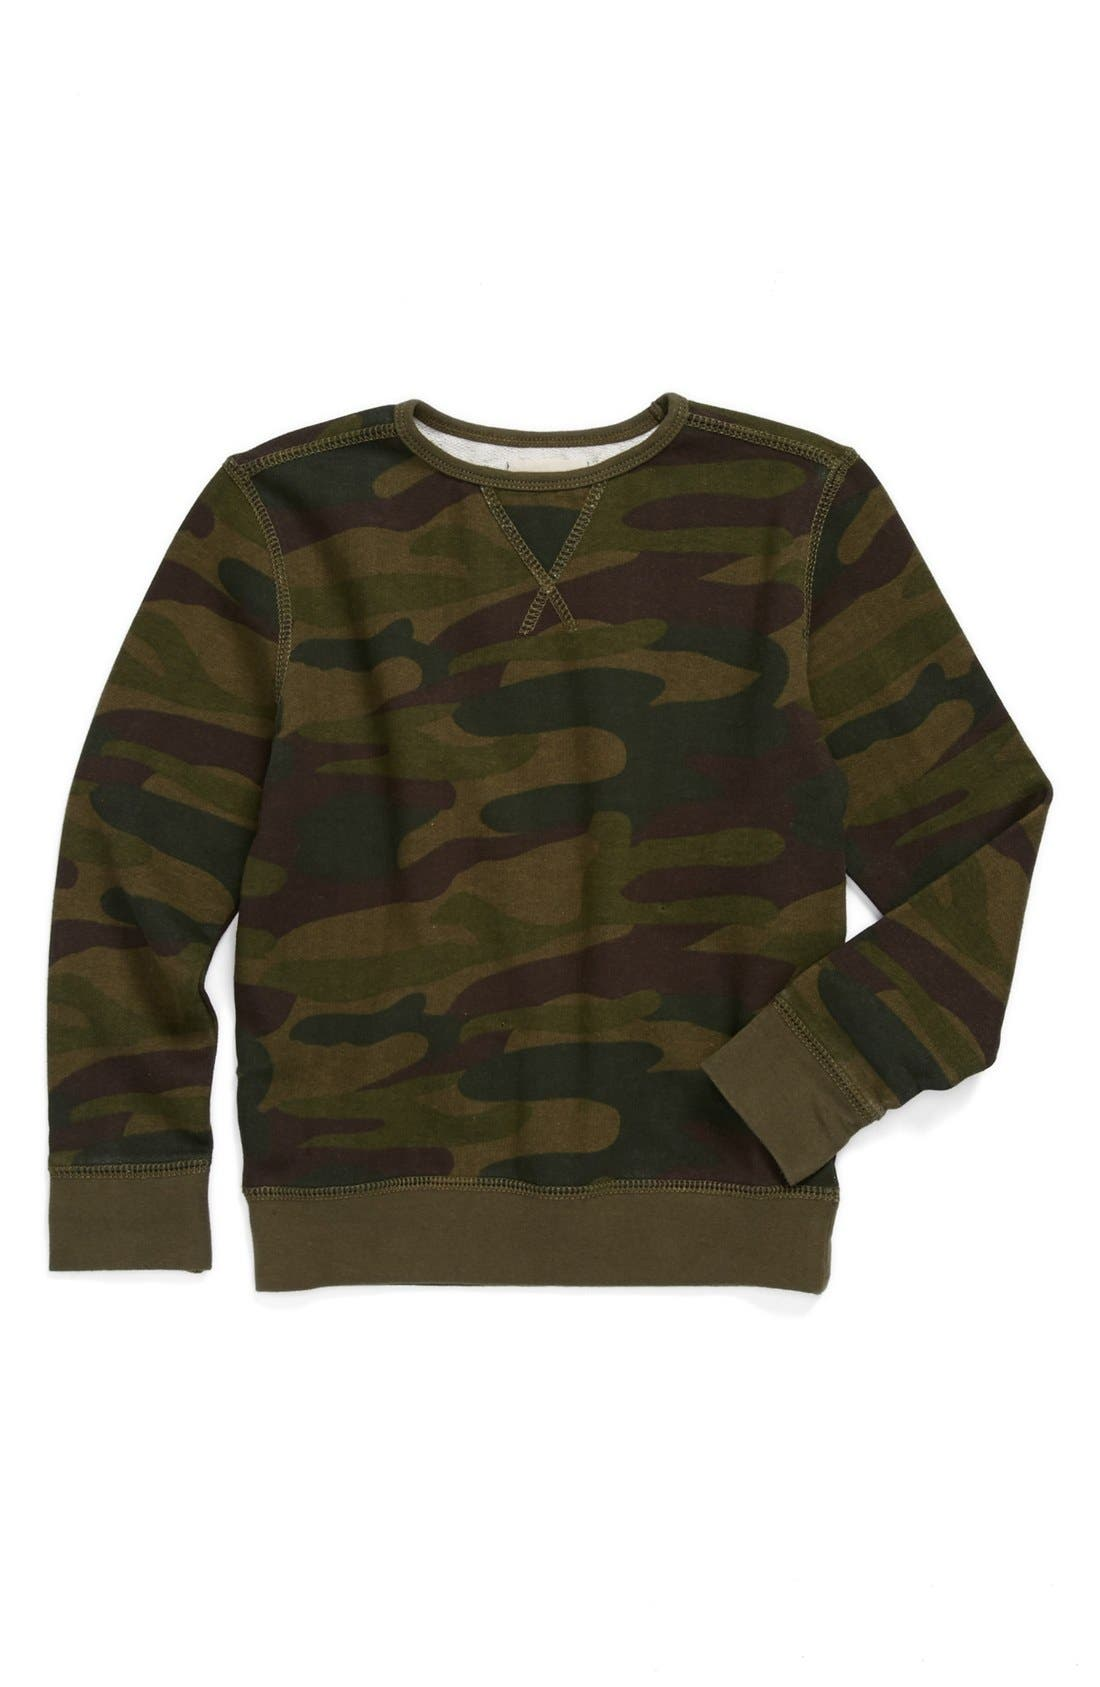 Main Image - Peek 'Camo' Sweatshirt (Toddler Boys, Little Boys & Big Boys)